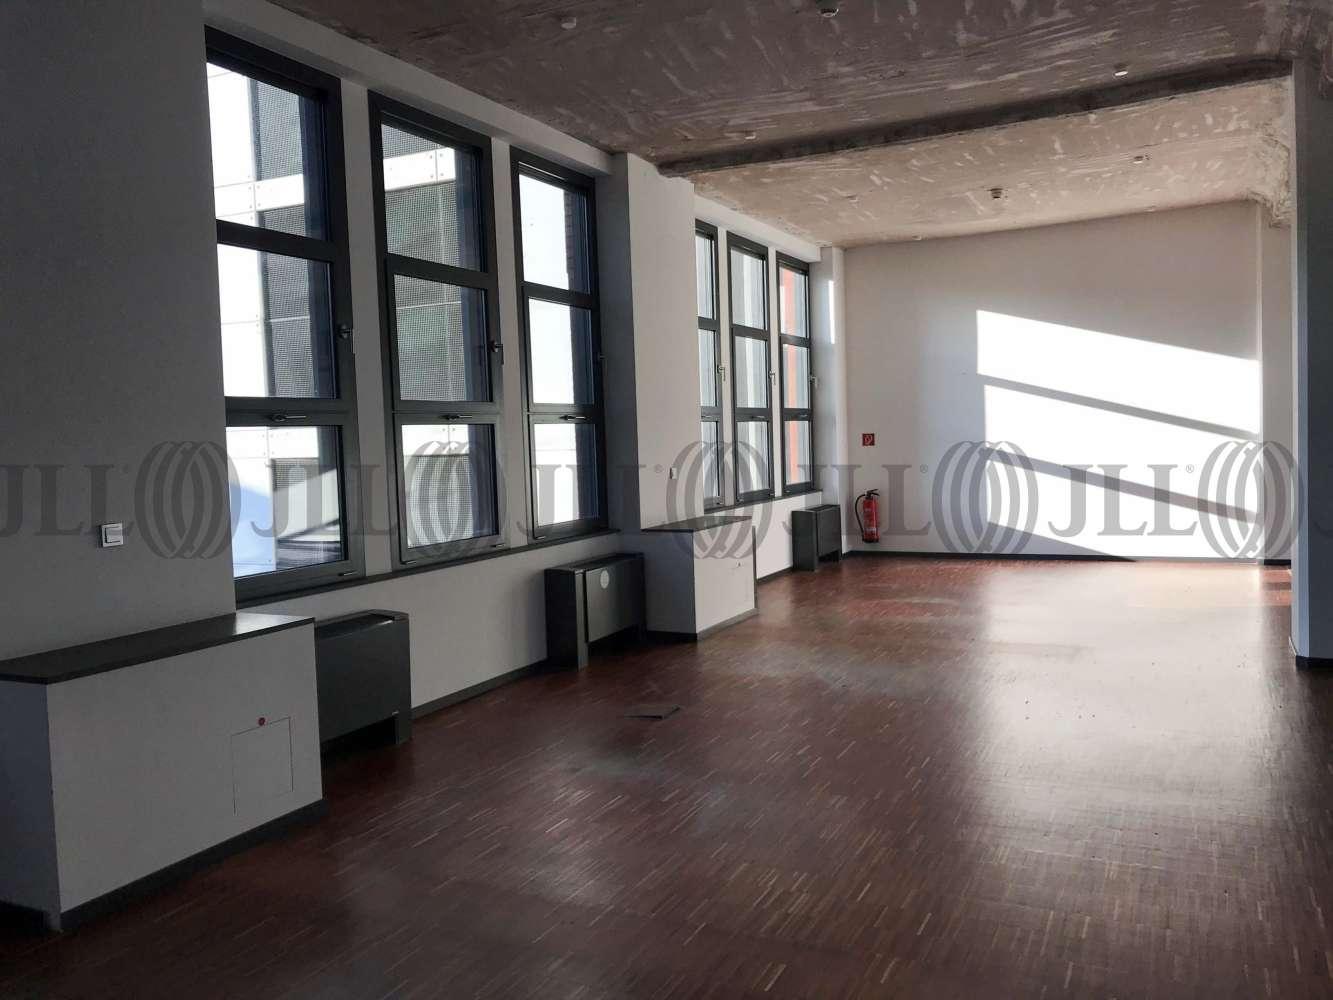 Büros Frankfurt am main, 60314 - Büro - Frankfurt am Main, Ostend - F2504 - 10878379